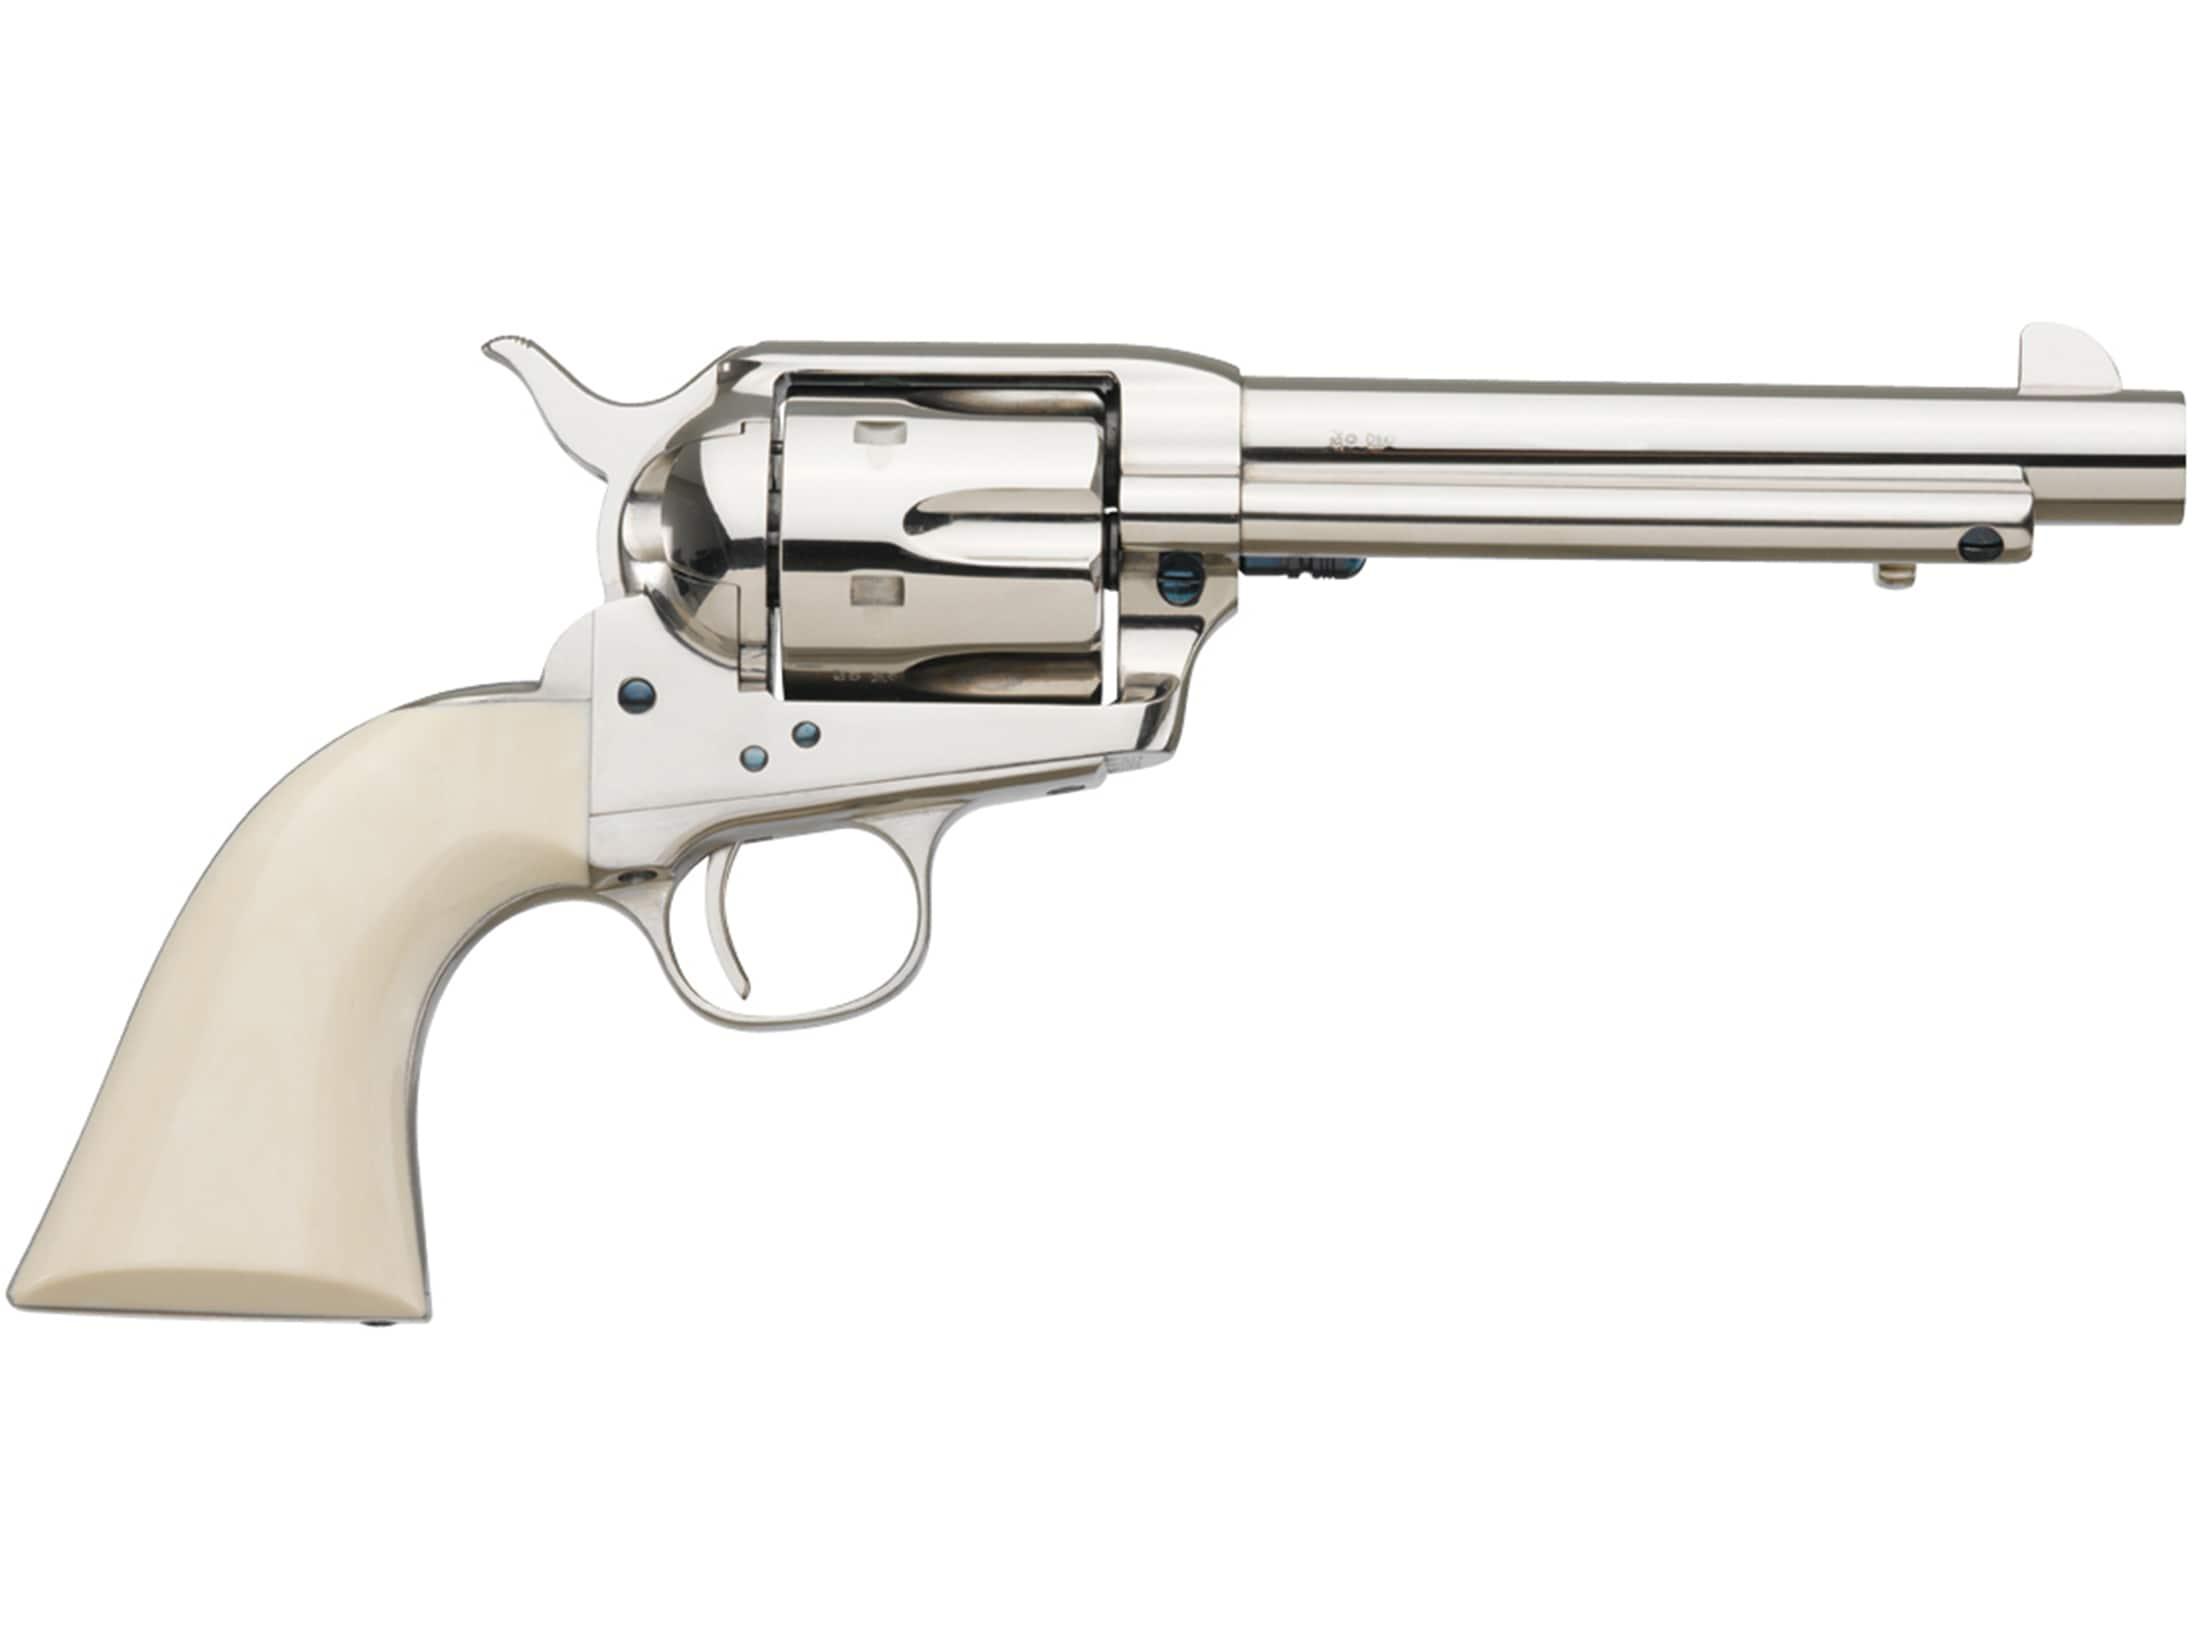 "Image of Uberti 1873 Cattleman II Cody 45 Colt (Long Colt) Revolver 7.5"" Barrel"